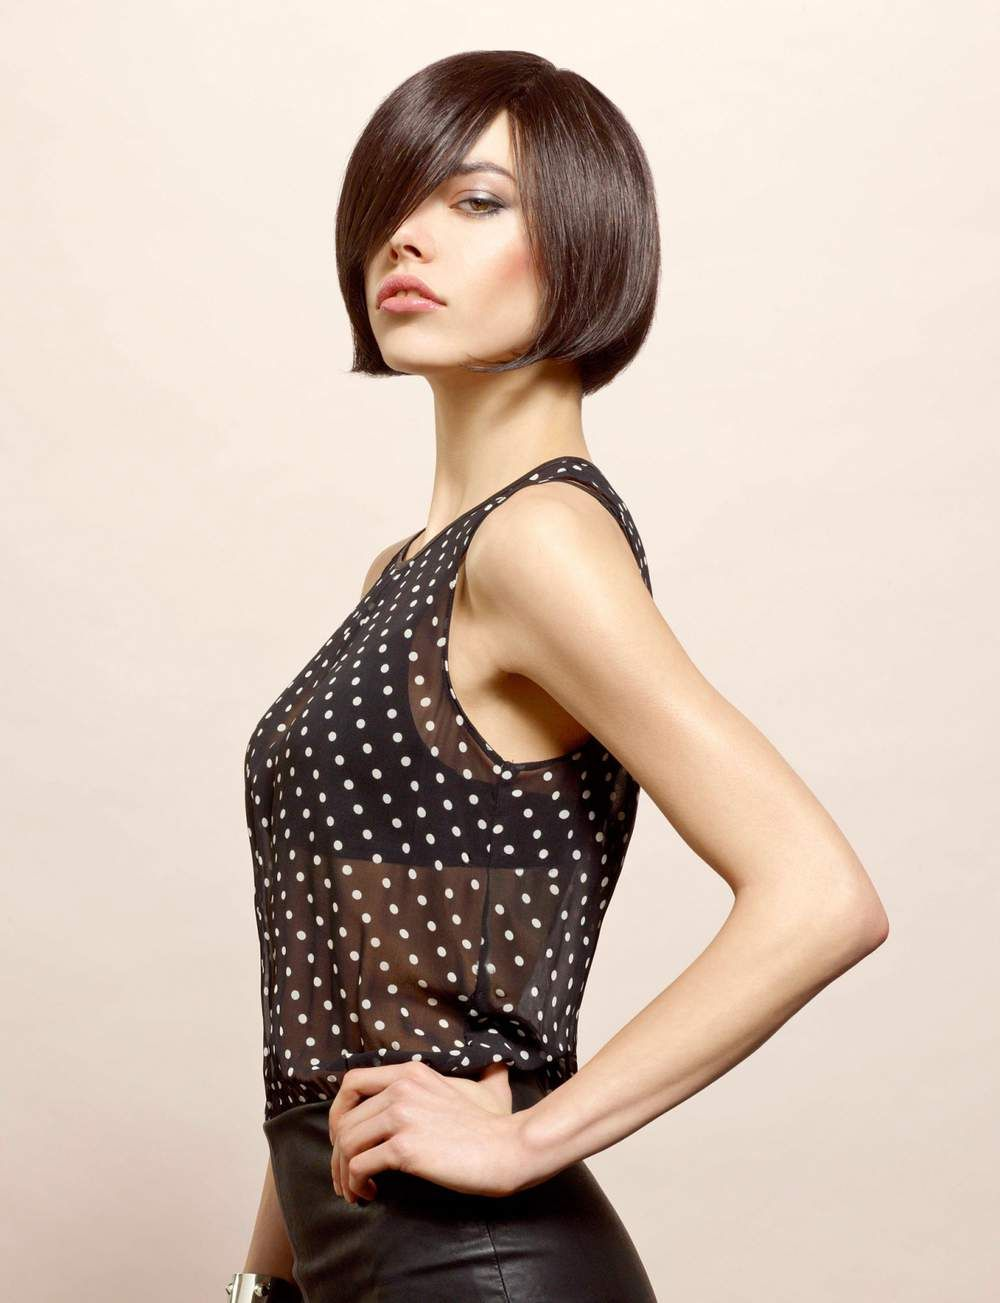 15 coupes au carr adopter femme actuelle coiffure colo coupe pinterest le. Black Bedroom Furniture Sets. Home Design Ideas